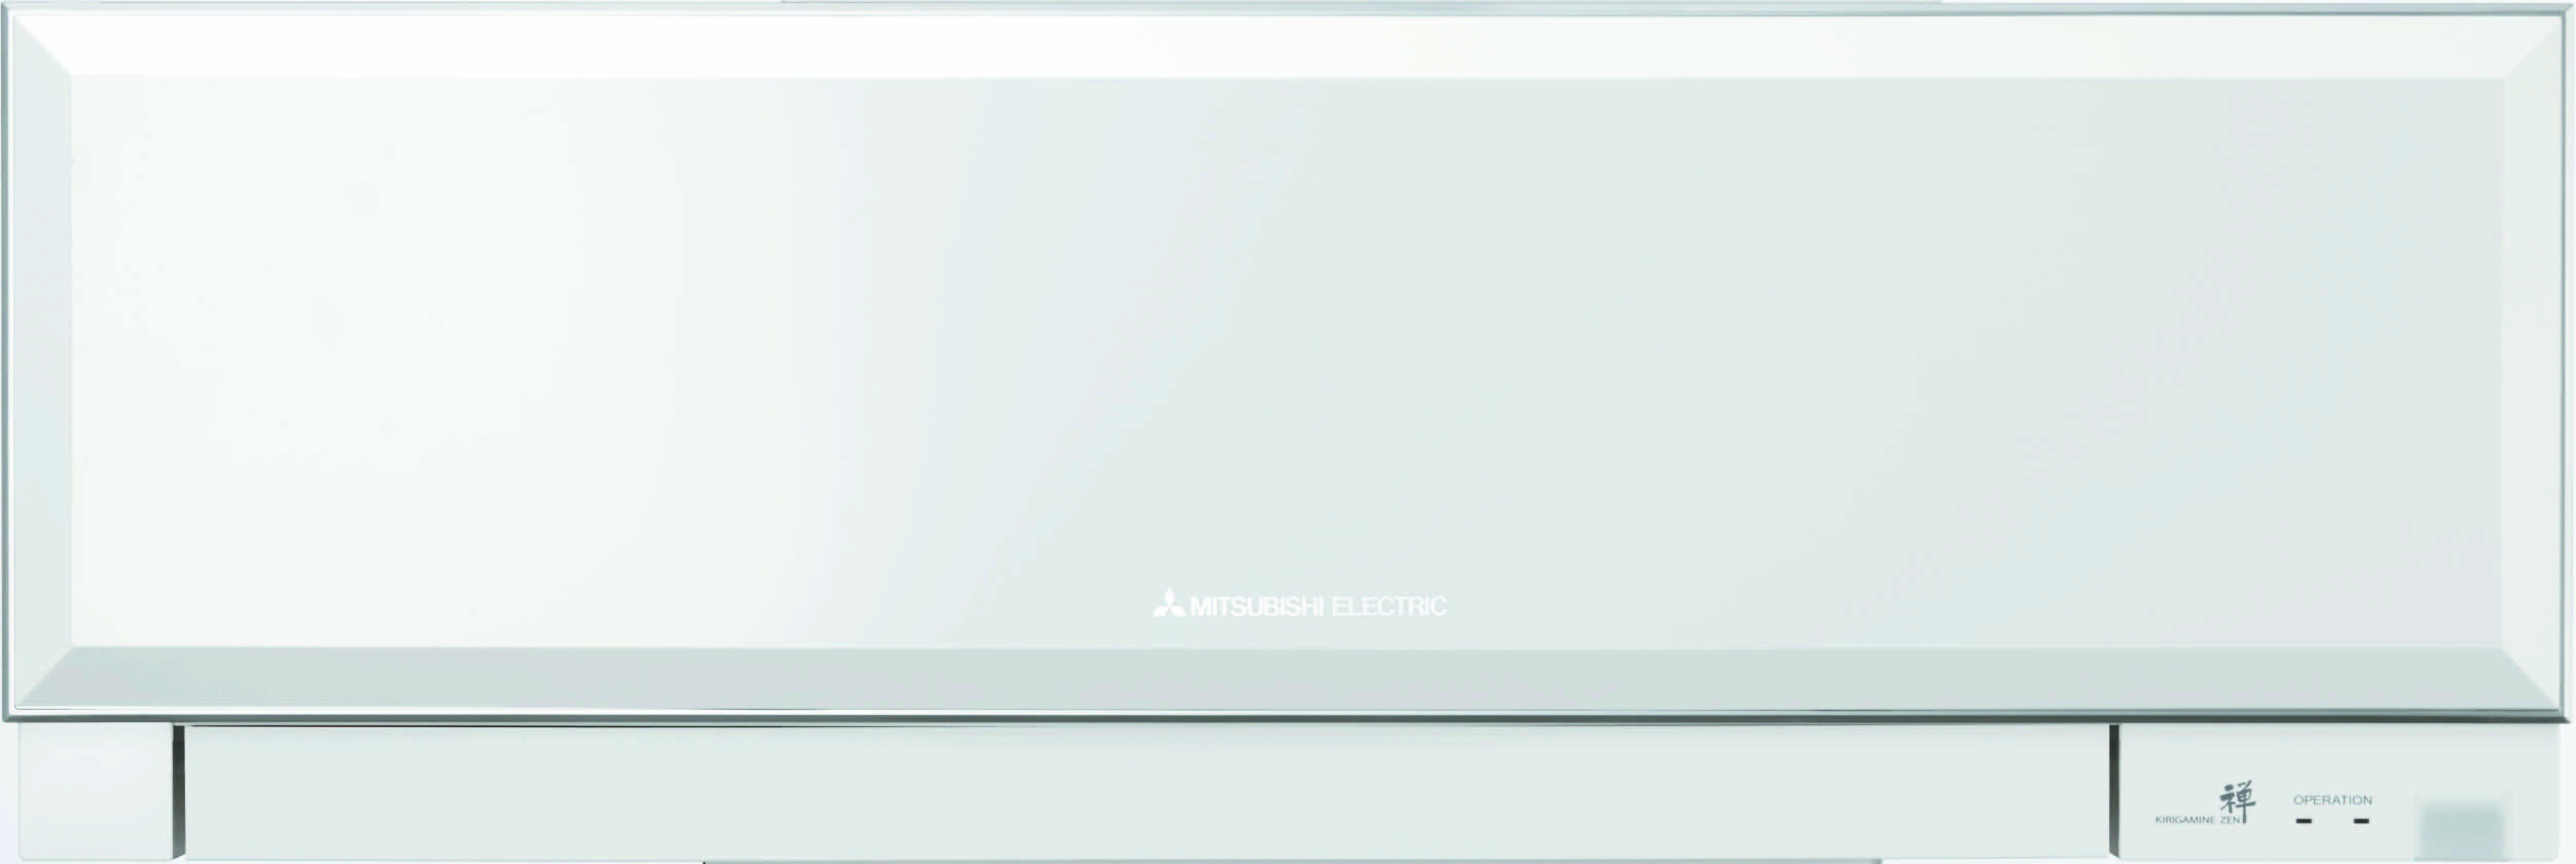 Mitsubishi Electric Split System EF Series White